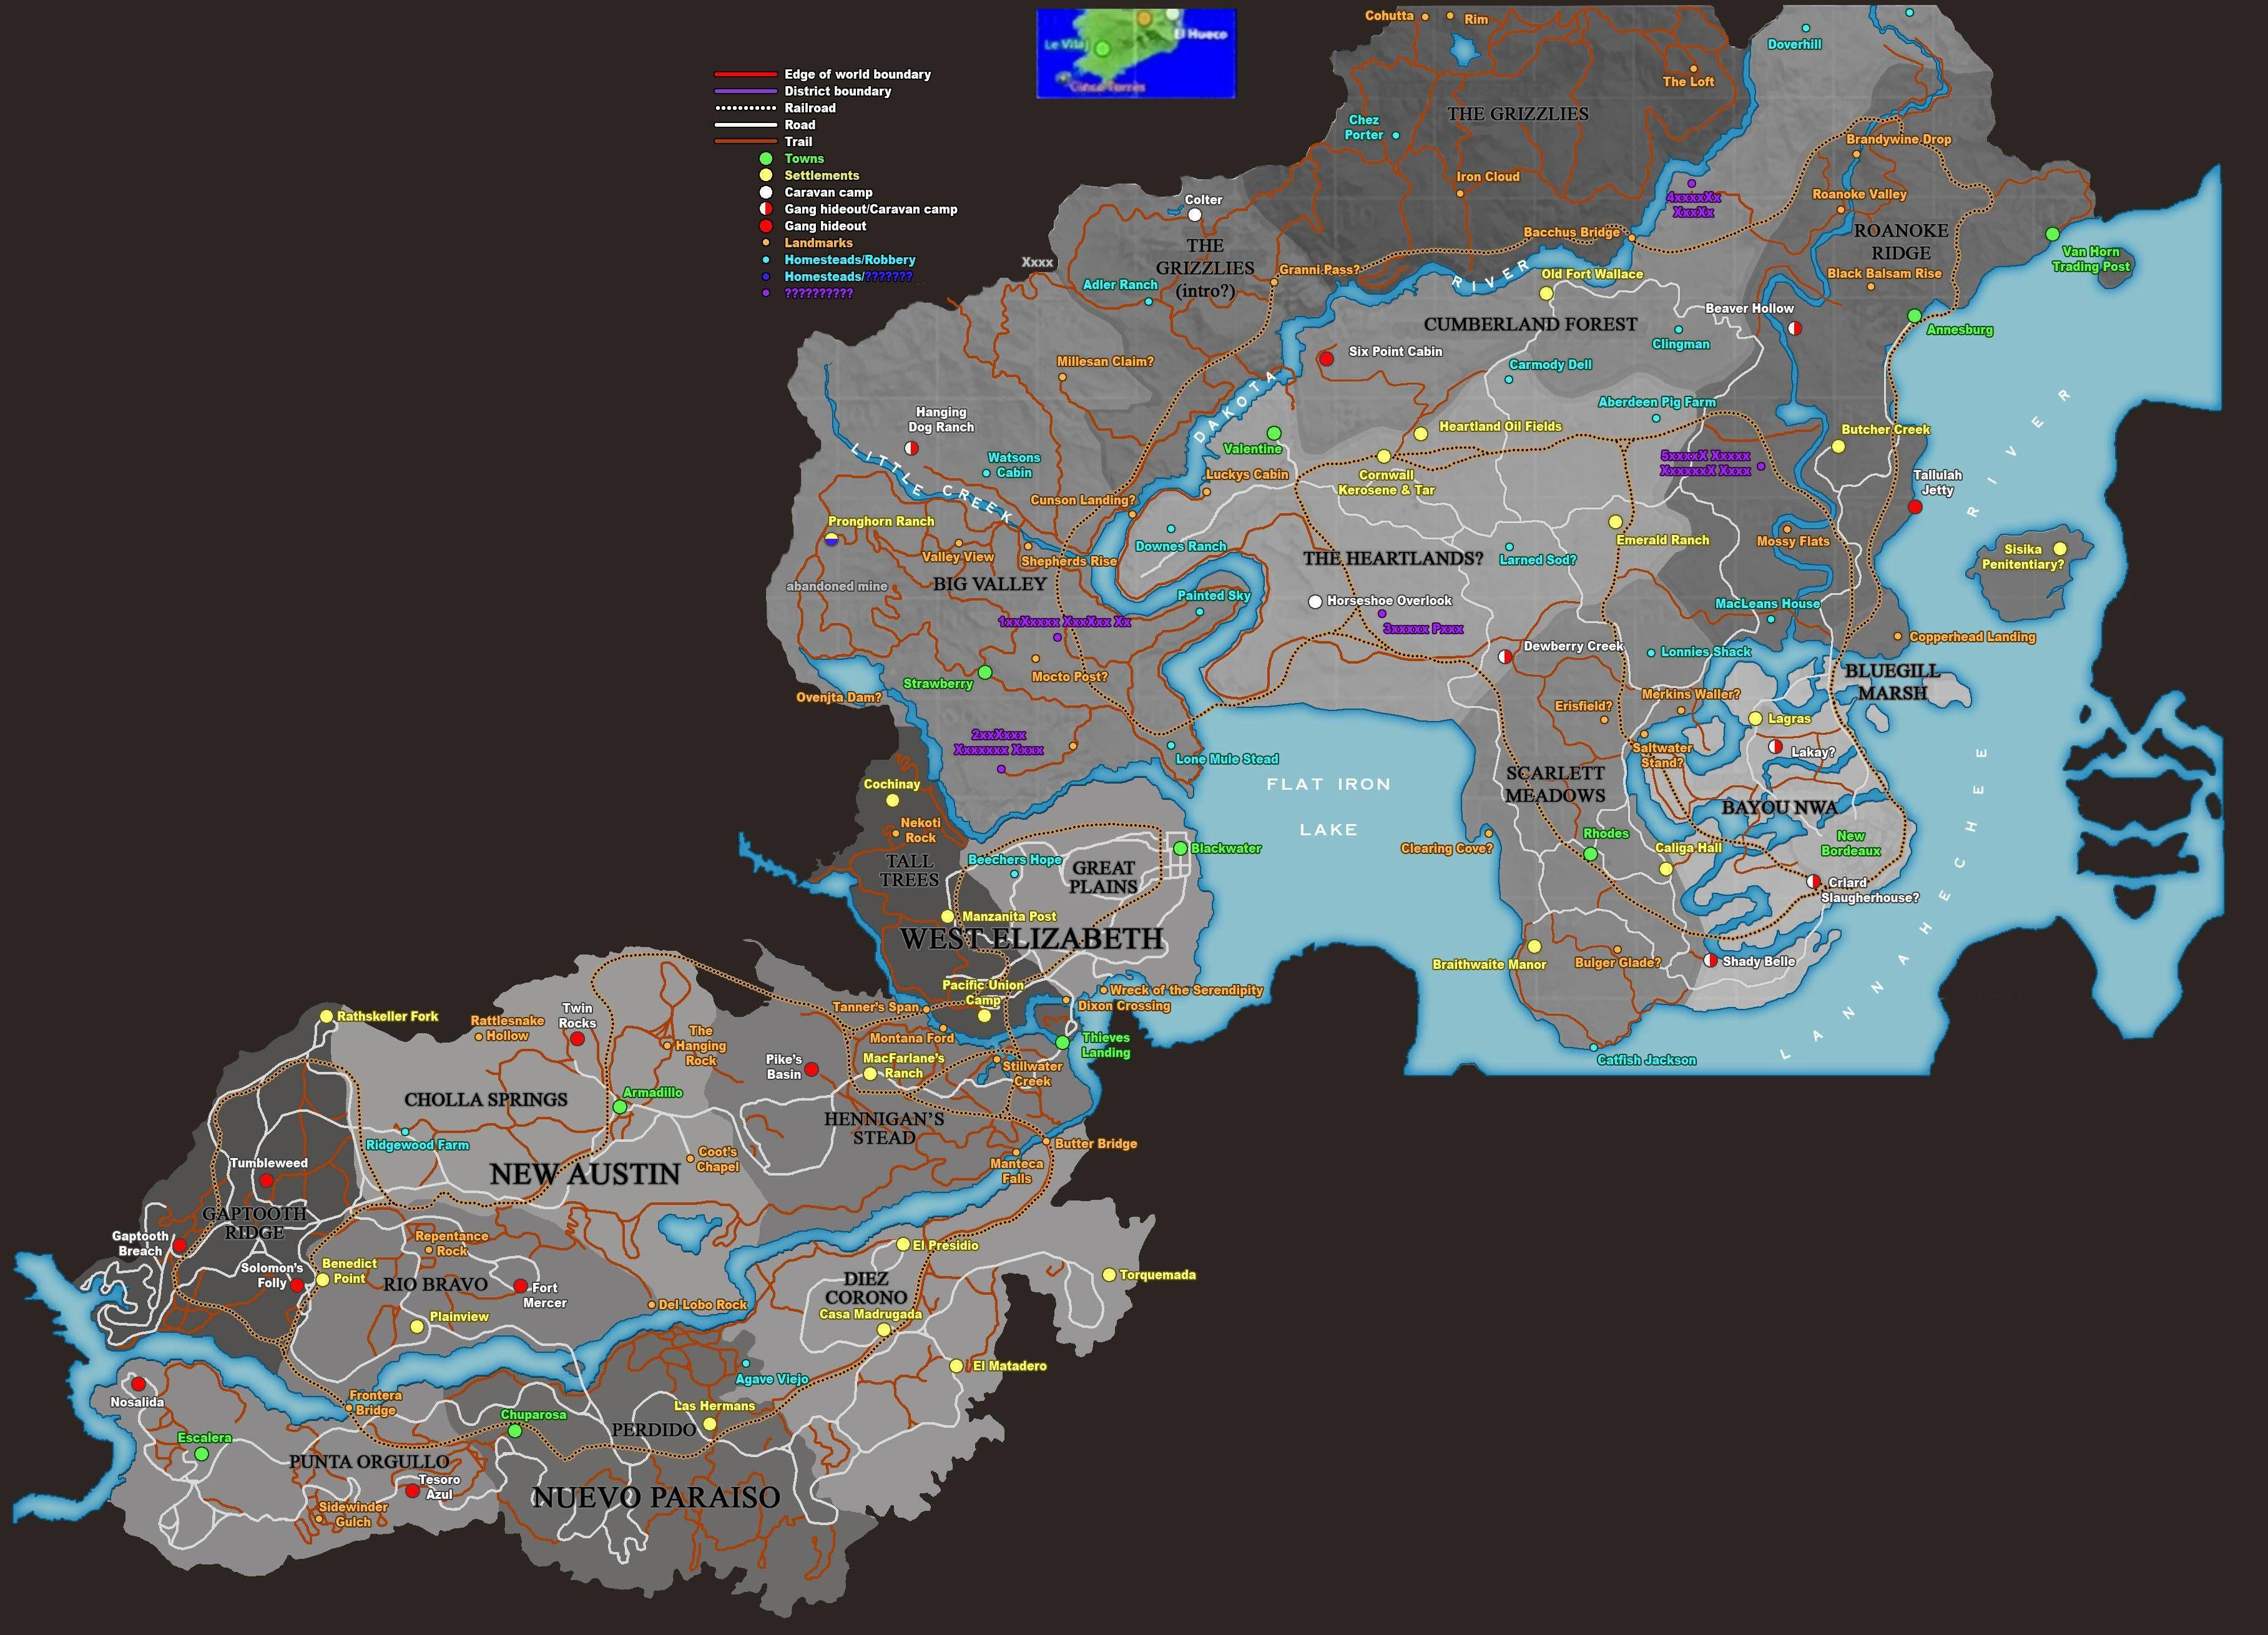 Red Dead Redemption 2 Icin Detayli Harita Yayinlandi Red Dead Redemption Western Games Map